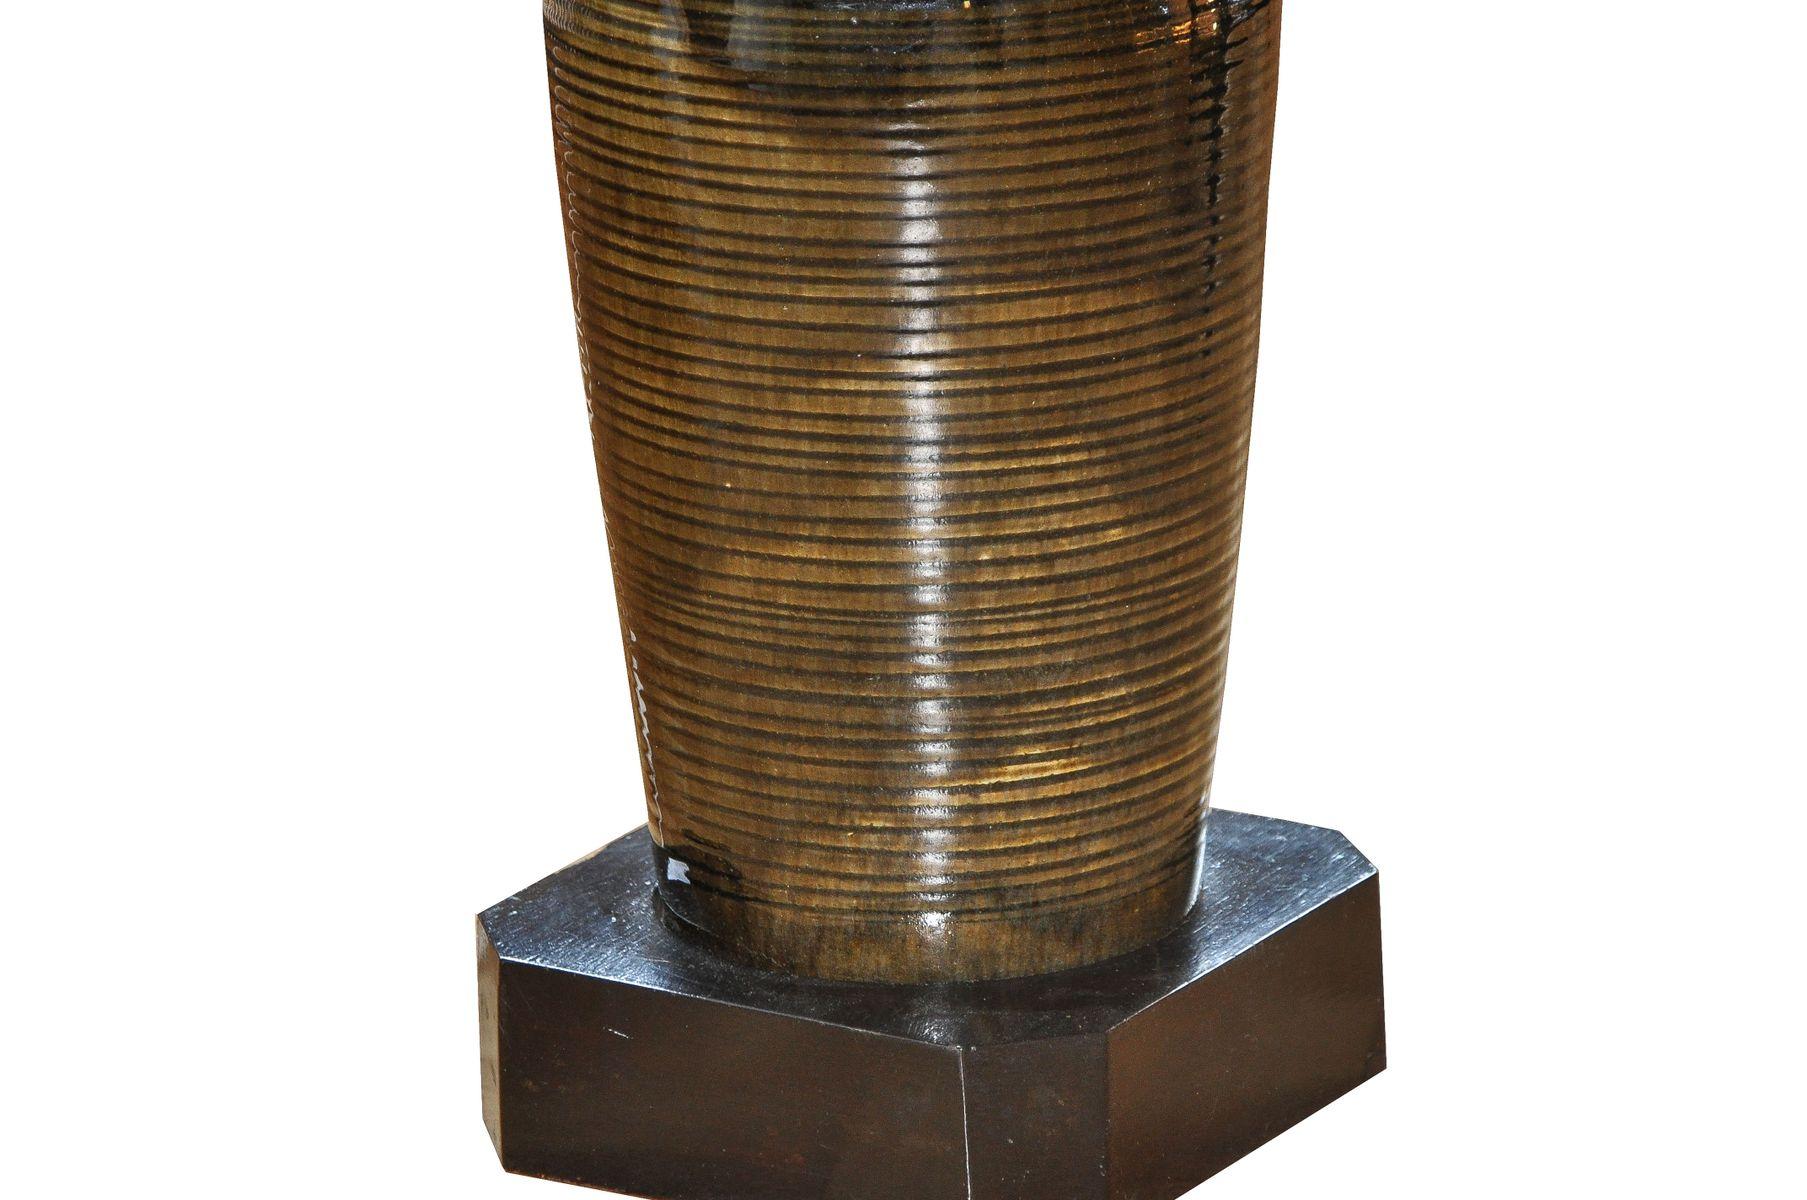 gro es mid century keramik tischlampe mit celadon glasur. Black Bedroom Furniture Sets. Home Design Ideas